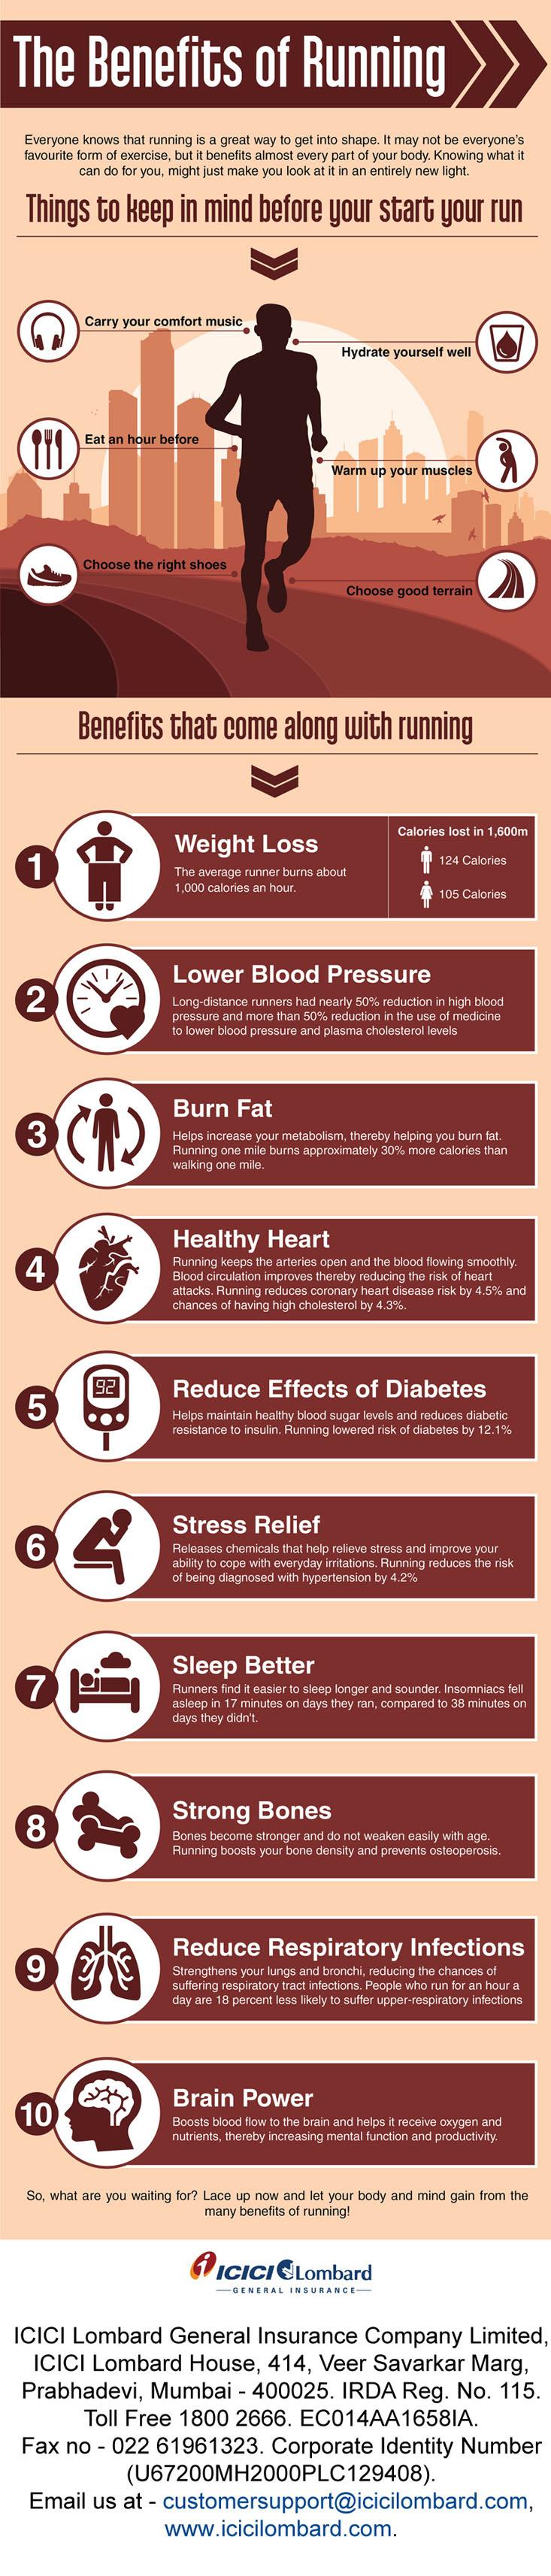 the-benefits-of-running